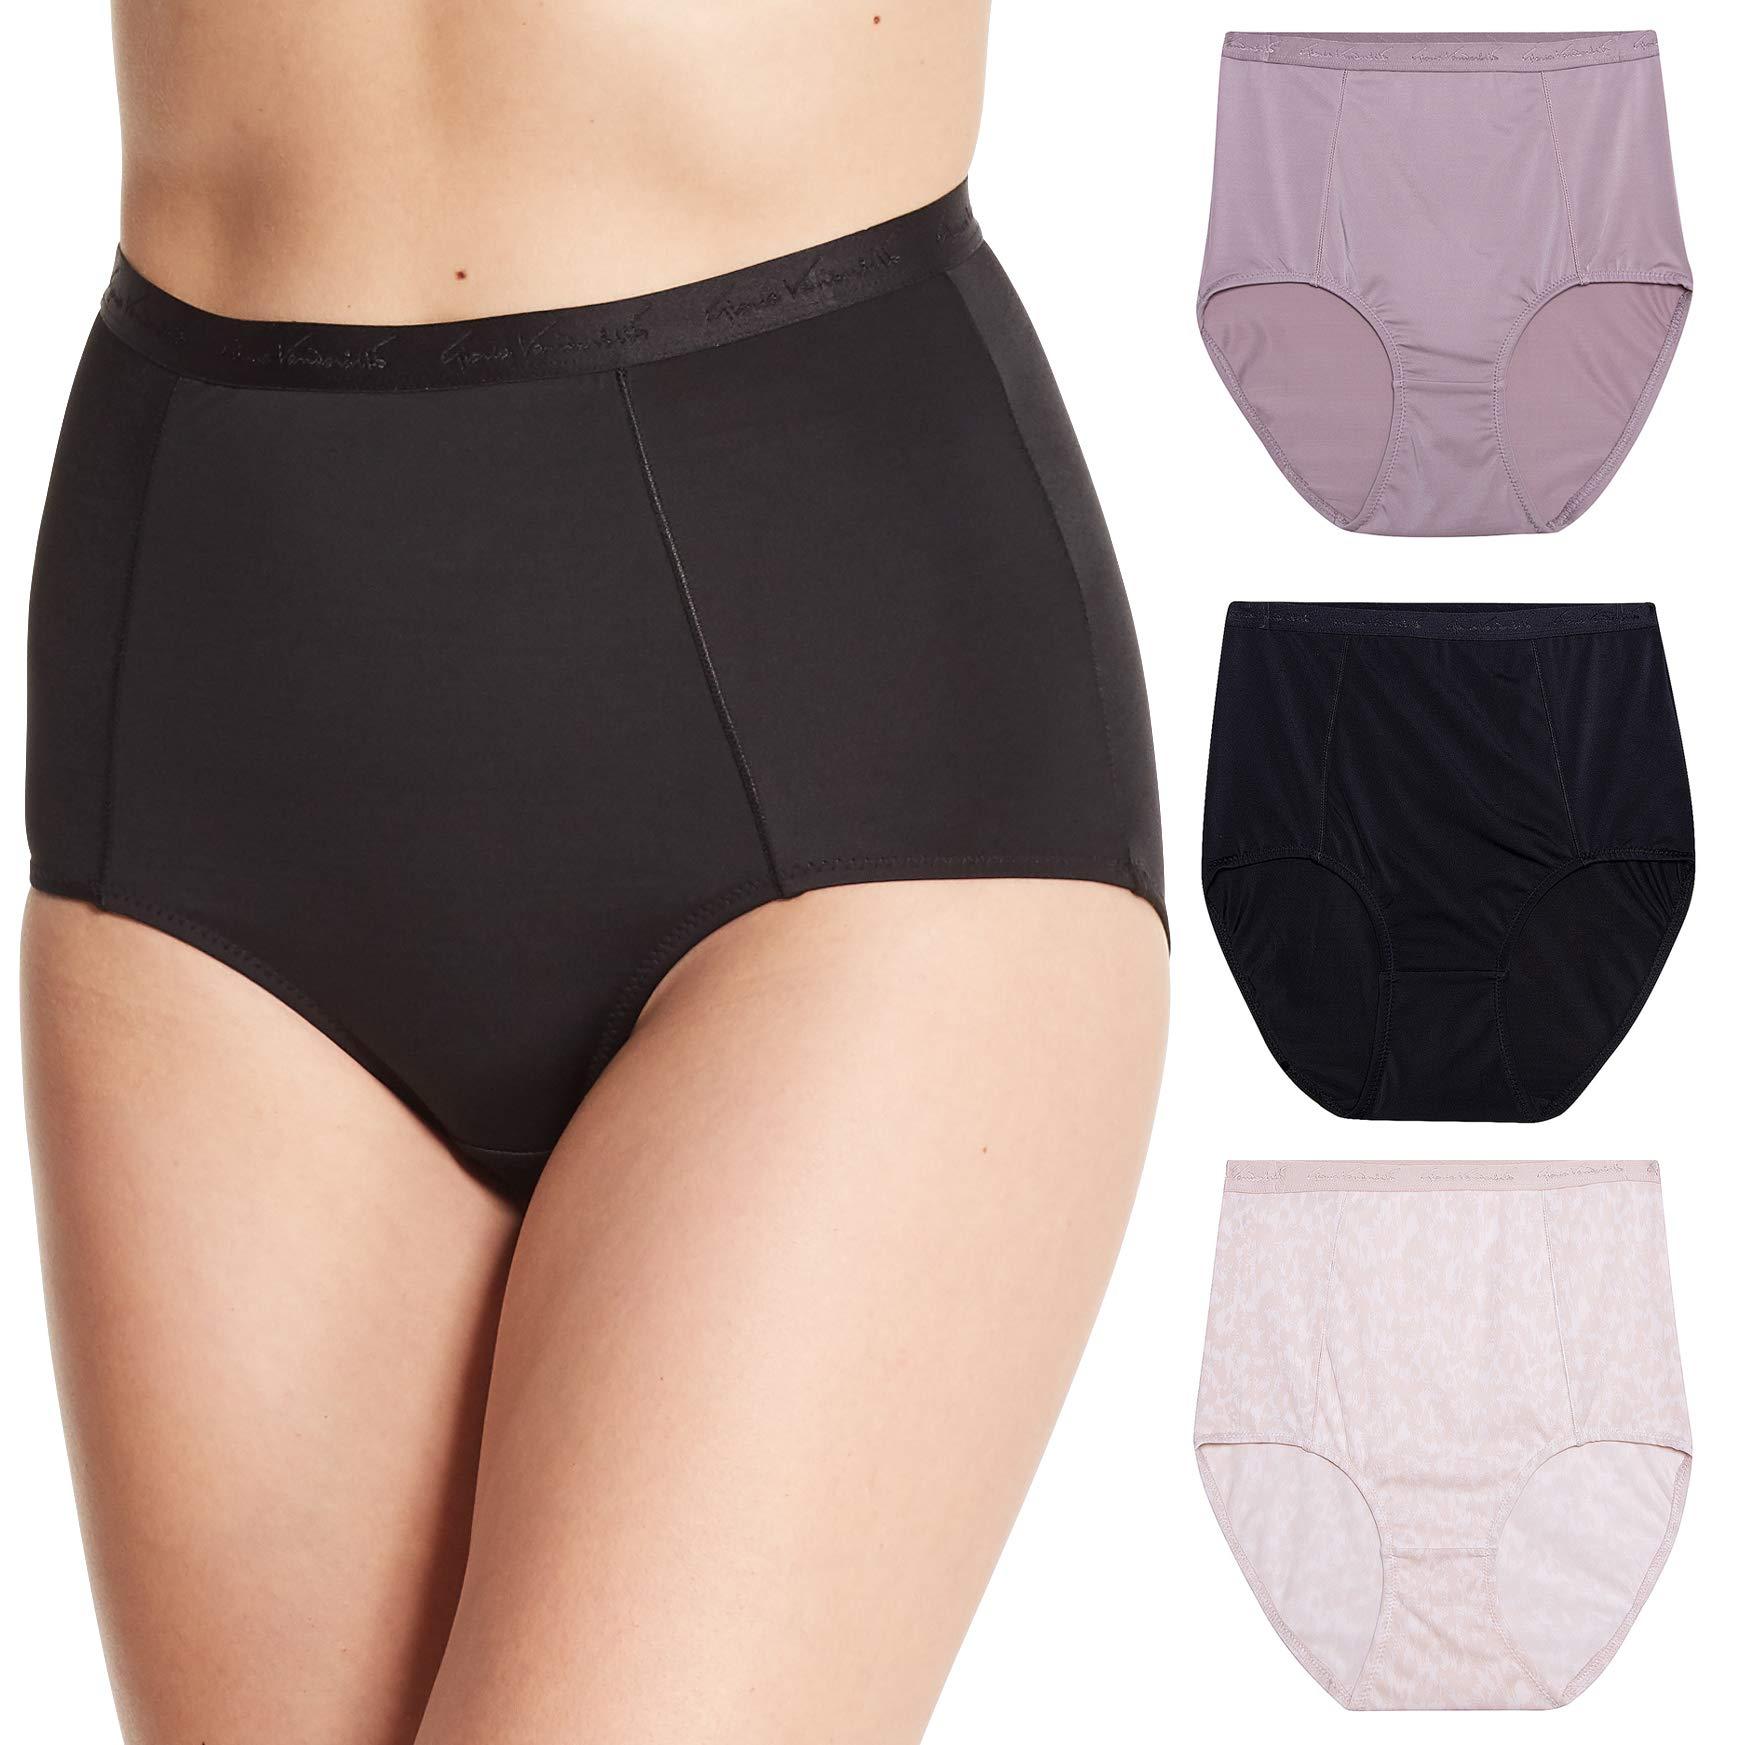 Gloria Vanderbilt Womens 3 Pack Tagless Microfiber Full Coverage Shapewear Brief Panties